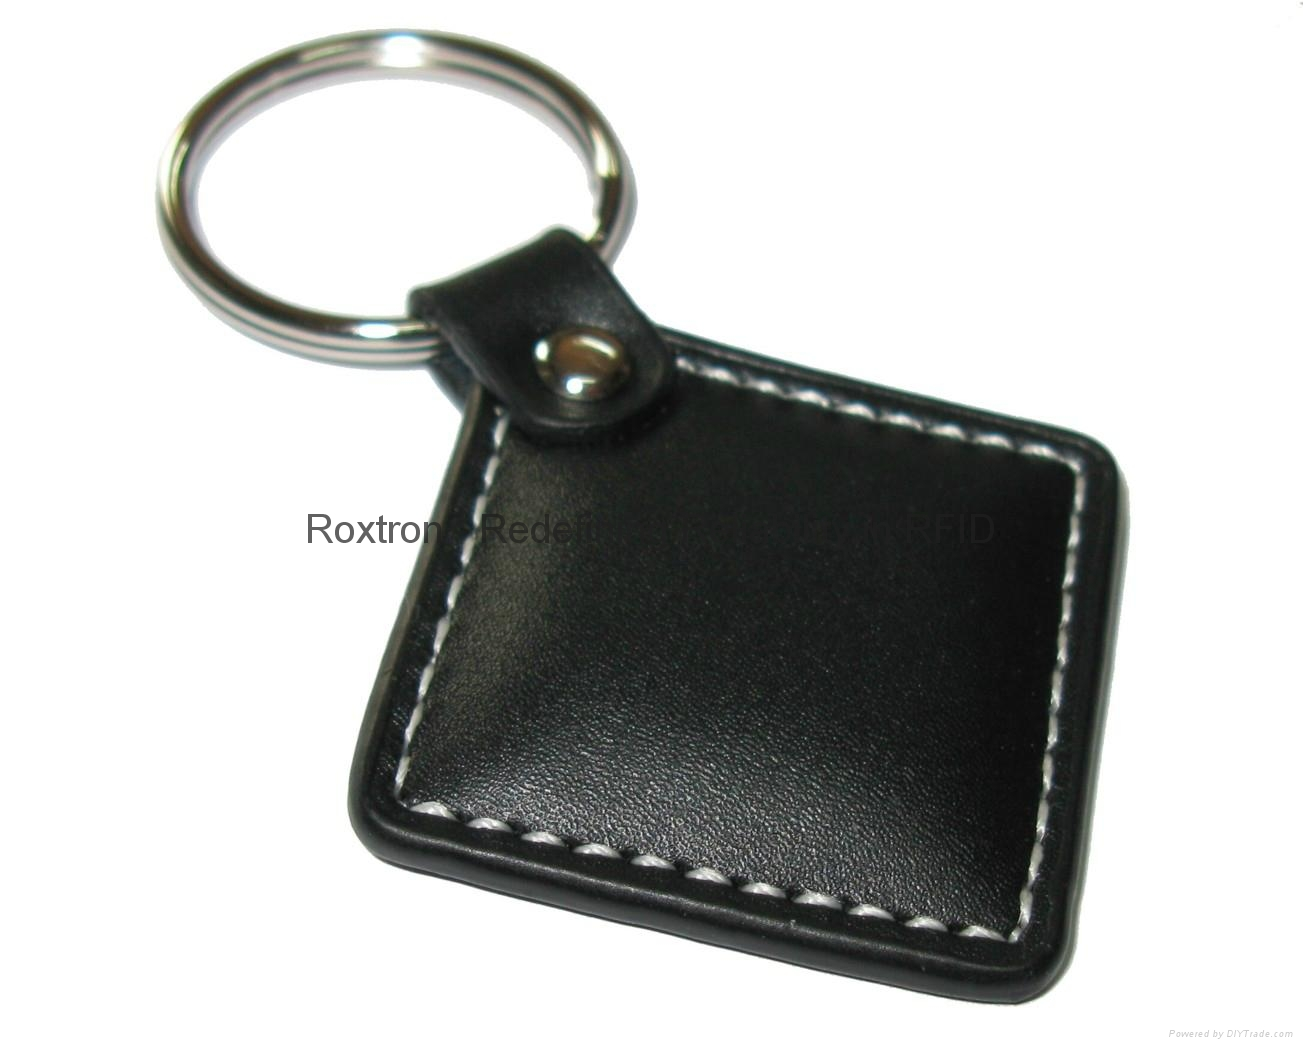 MIFARE Classic 1K RXK14 Leather Key Tag 10